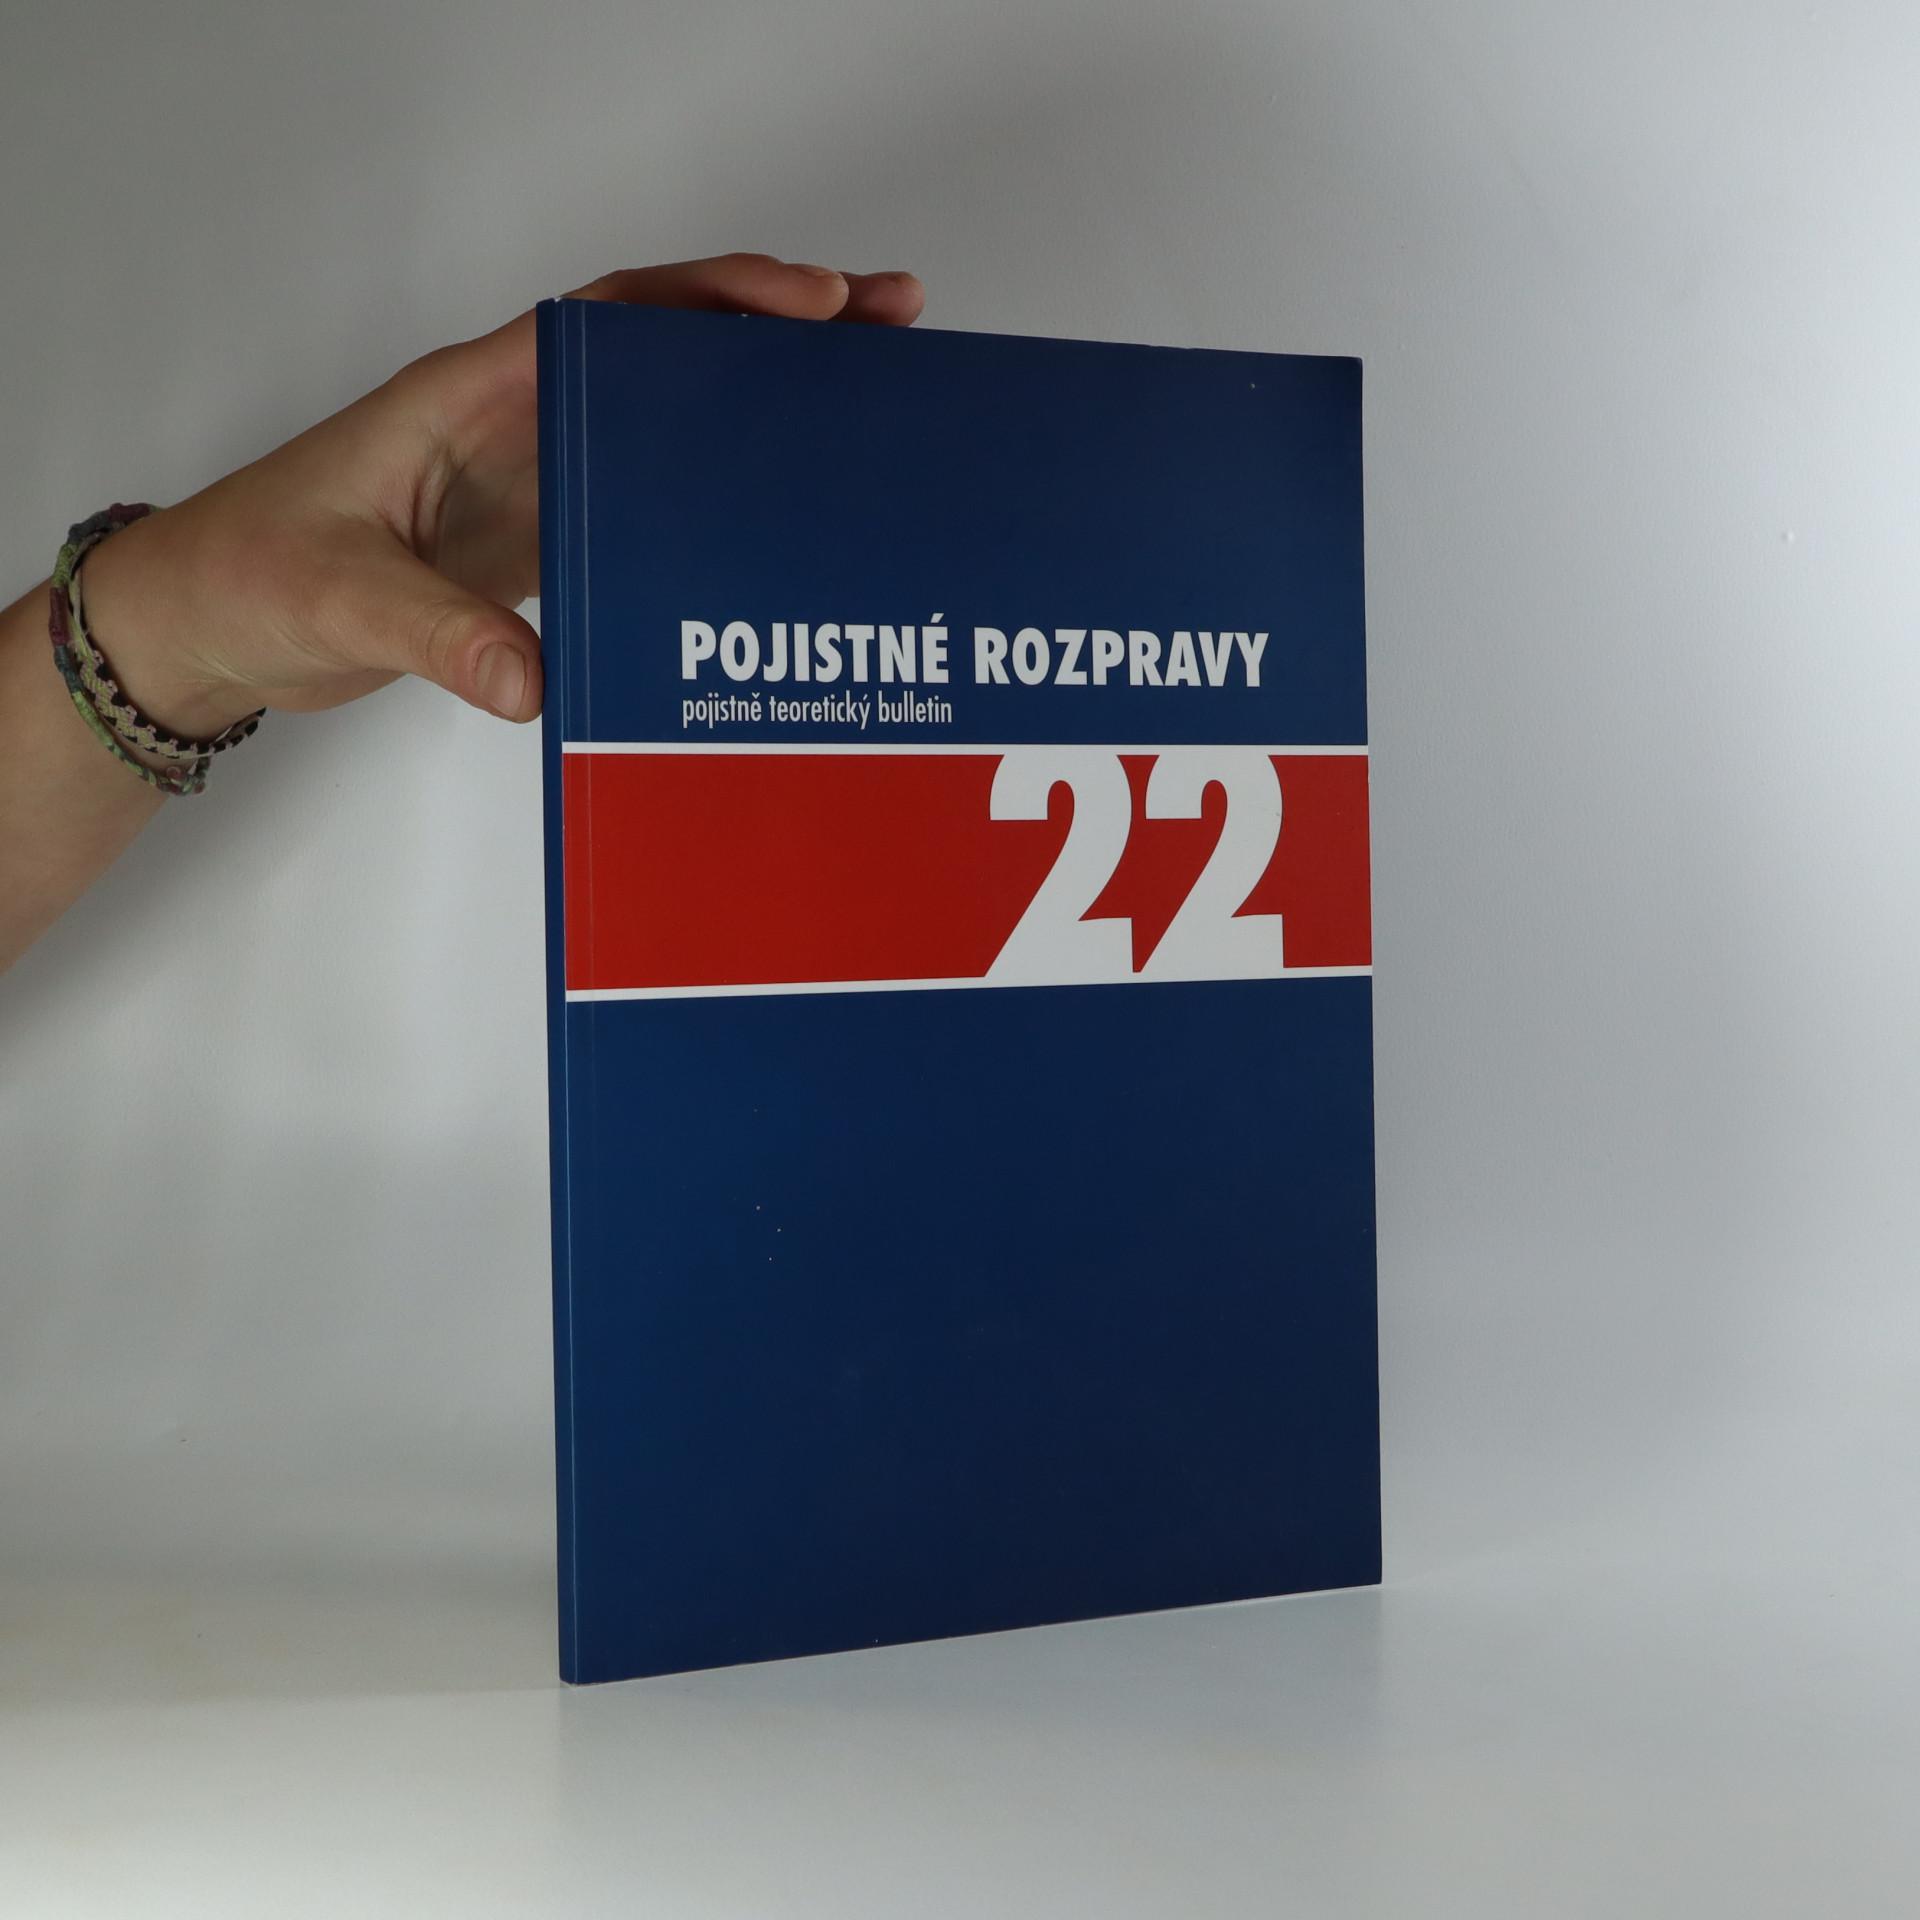 antikvární kniha Pojistné rozpravy (číslo 22), 2008